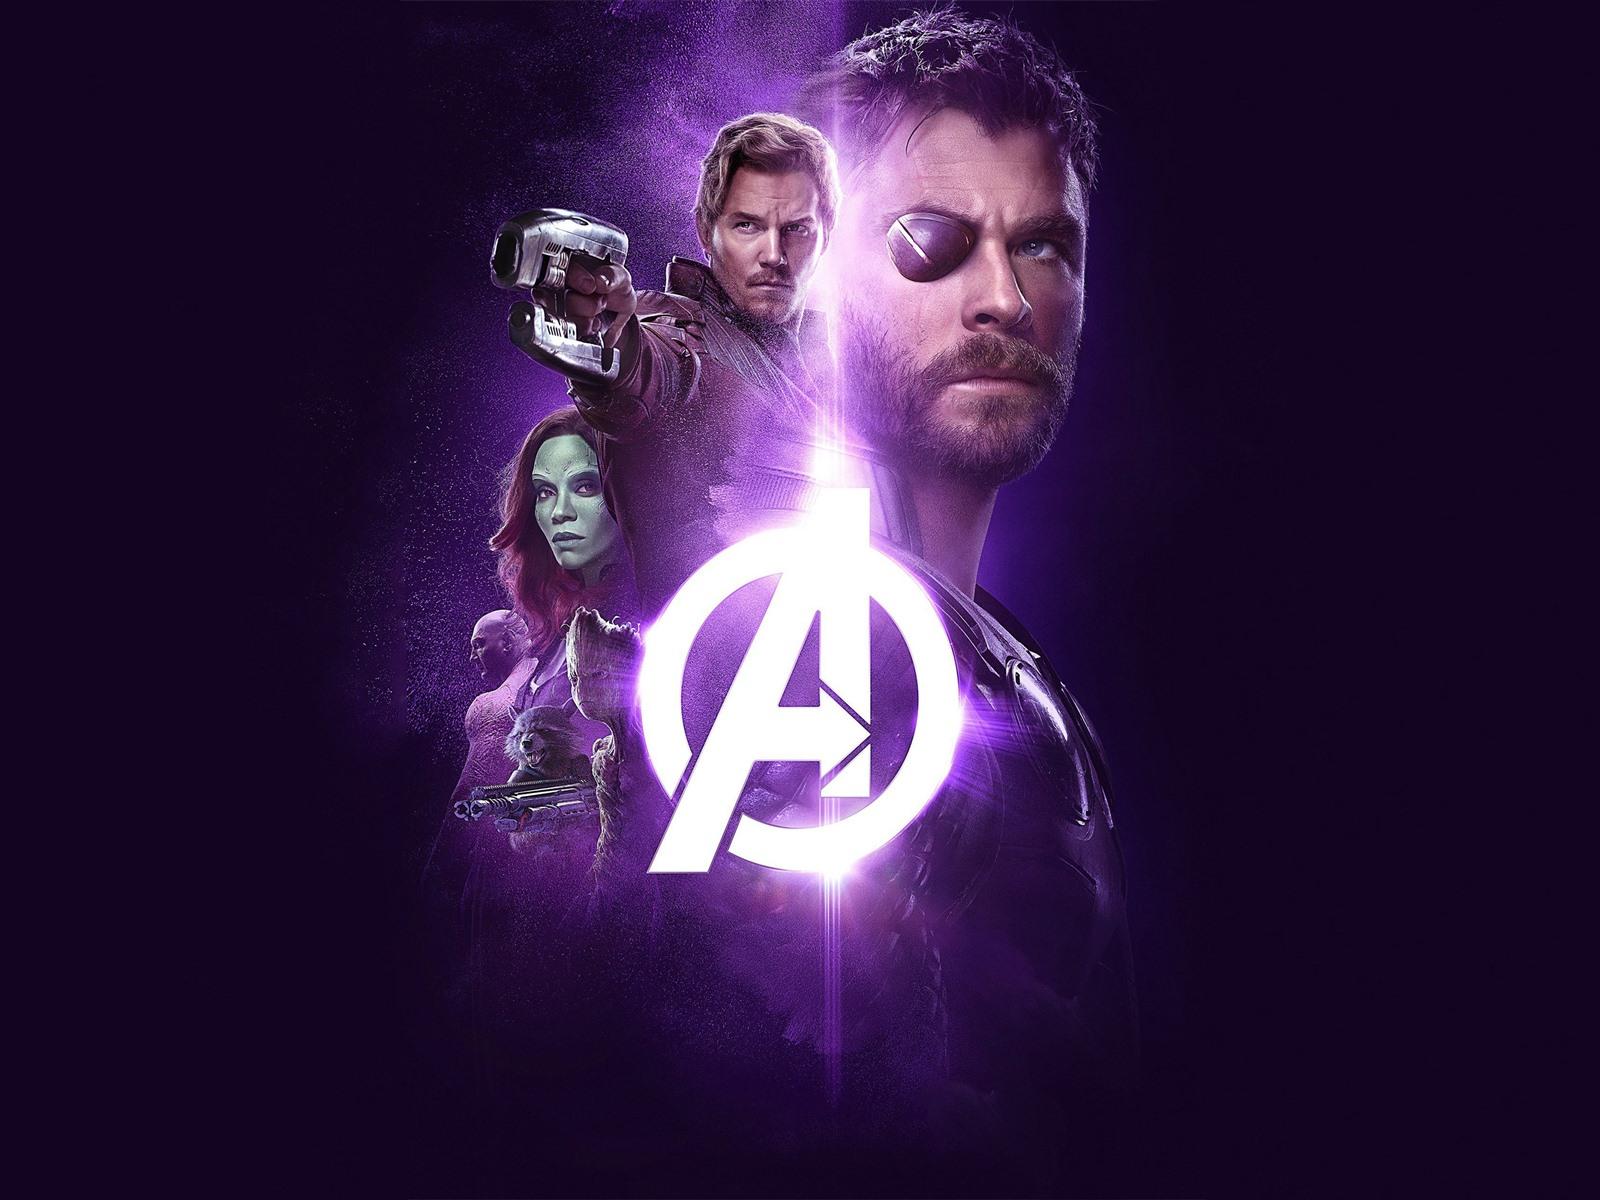 The Avengers: Infinity War, Superheroes, Black Background